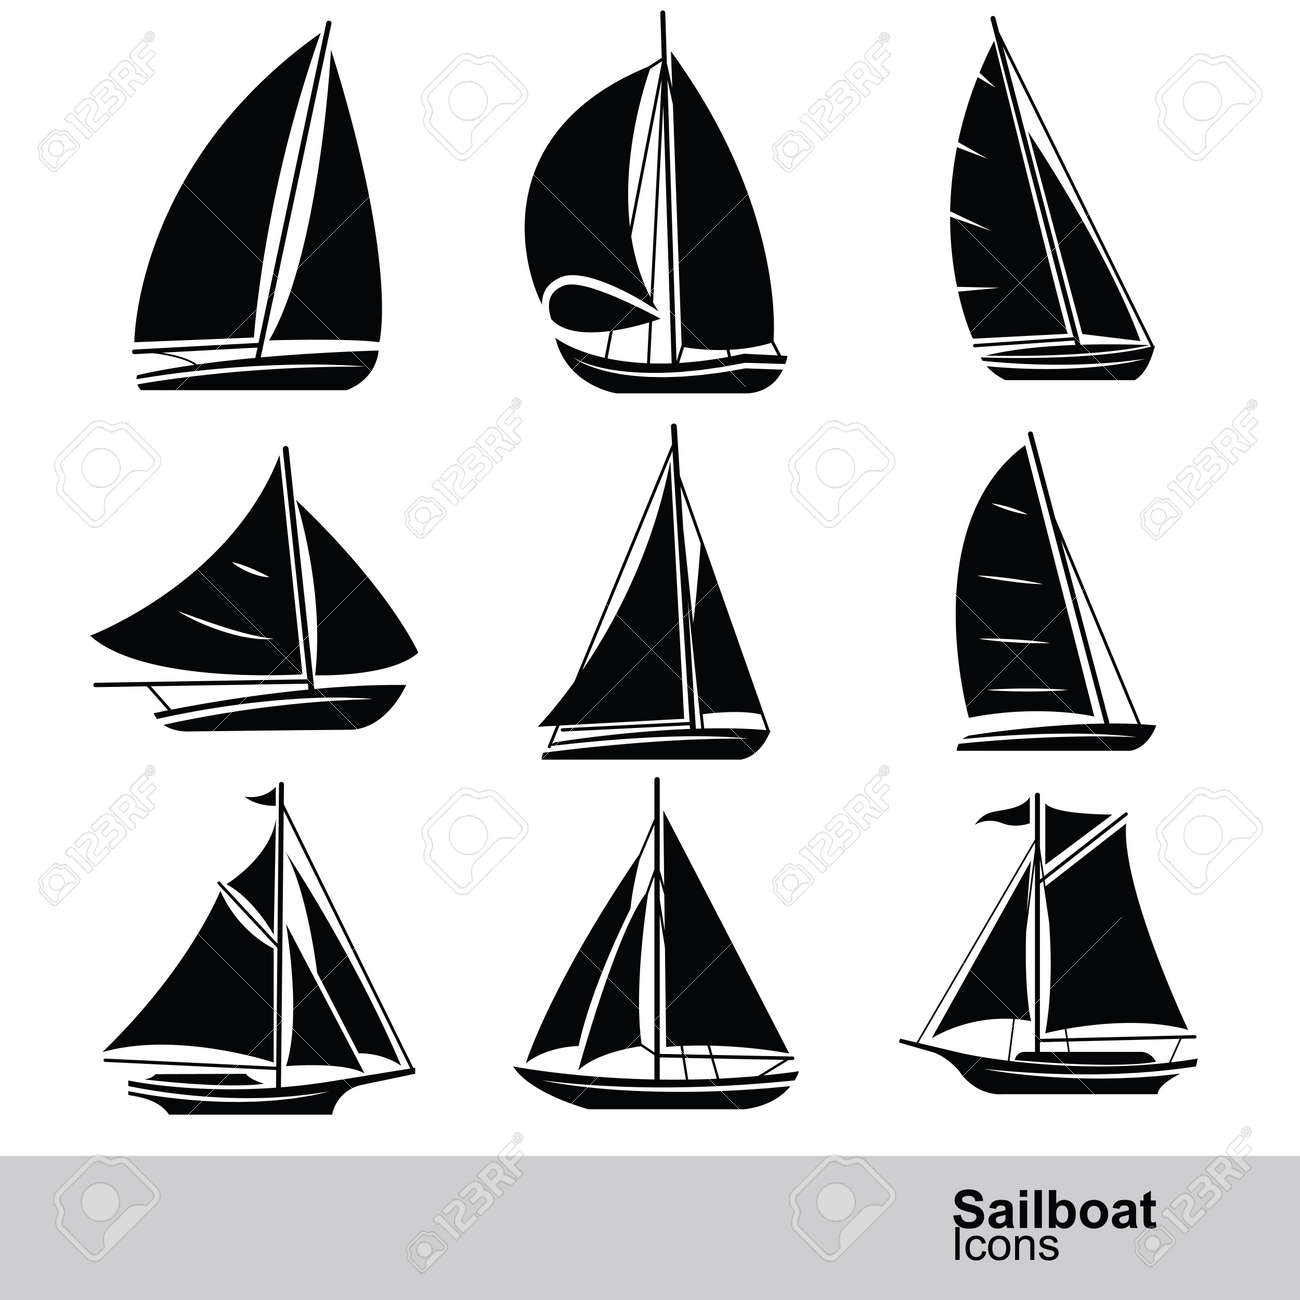 sailboat silhouette icon set ,vector illustration Stock Vector - 45013900